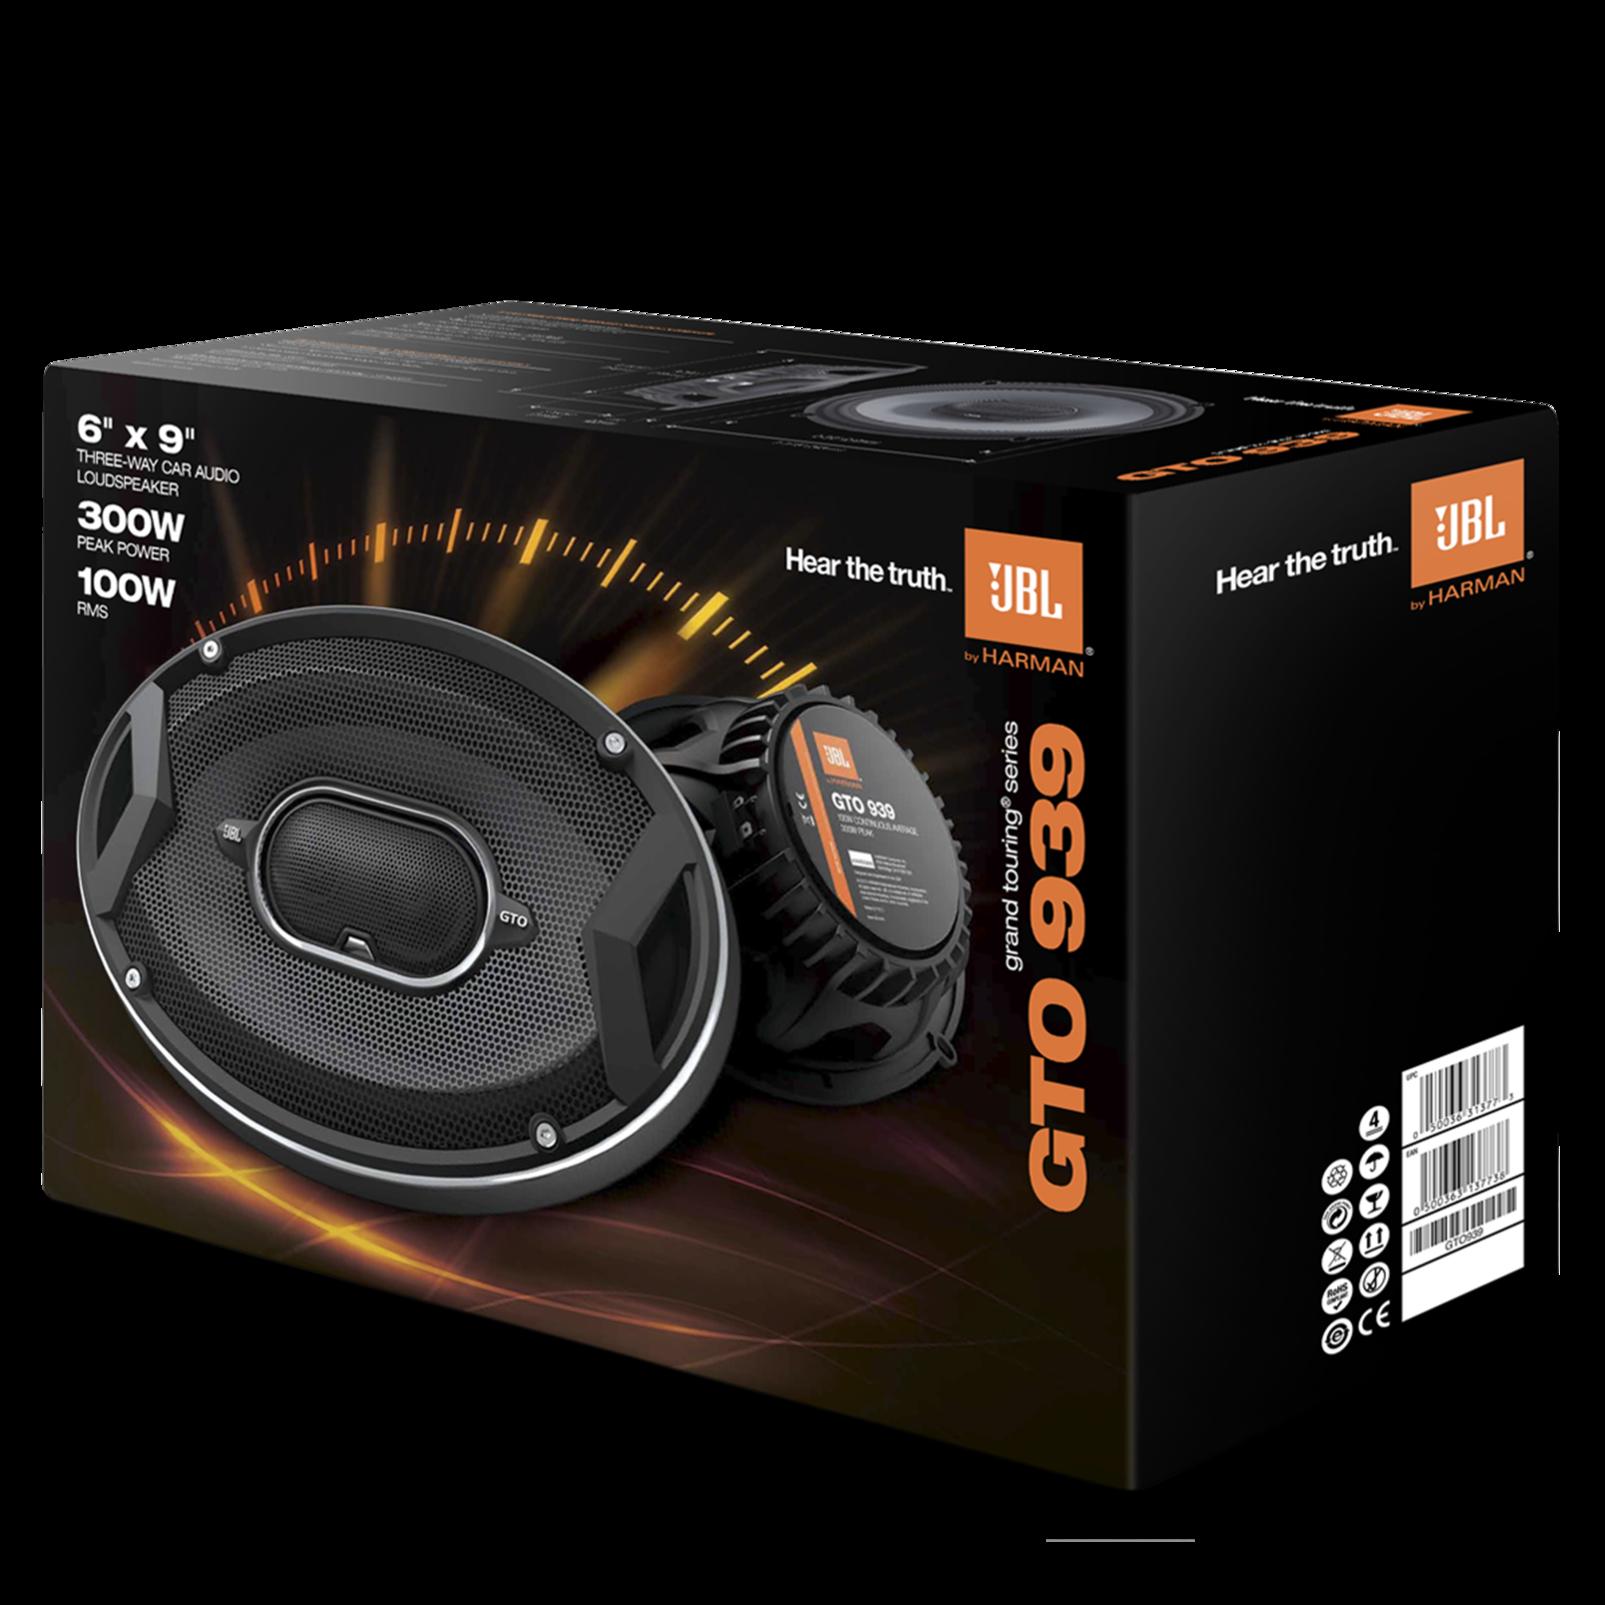 Gto939 300 Watt Three Way 6 X 9 Speaker System With Tweeter Ultimate Eq Wiring Diagram Manuals Downloads